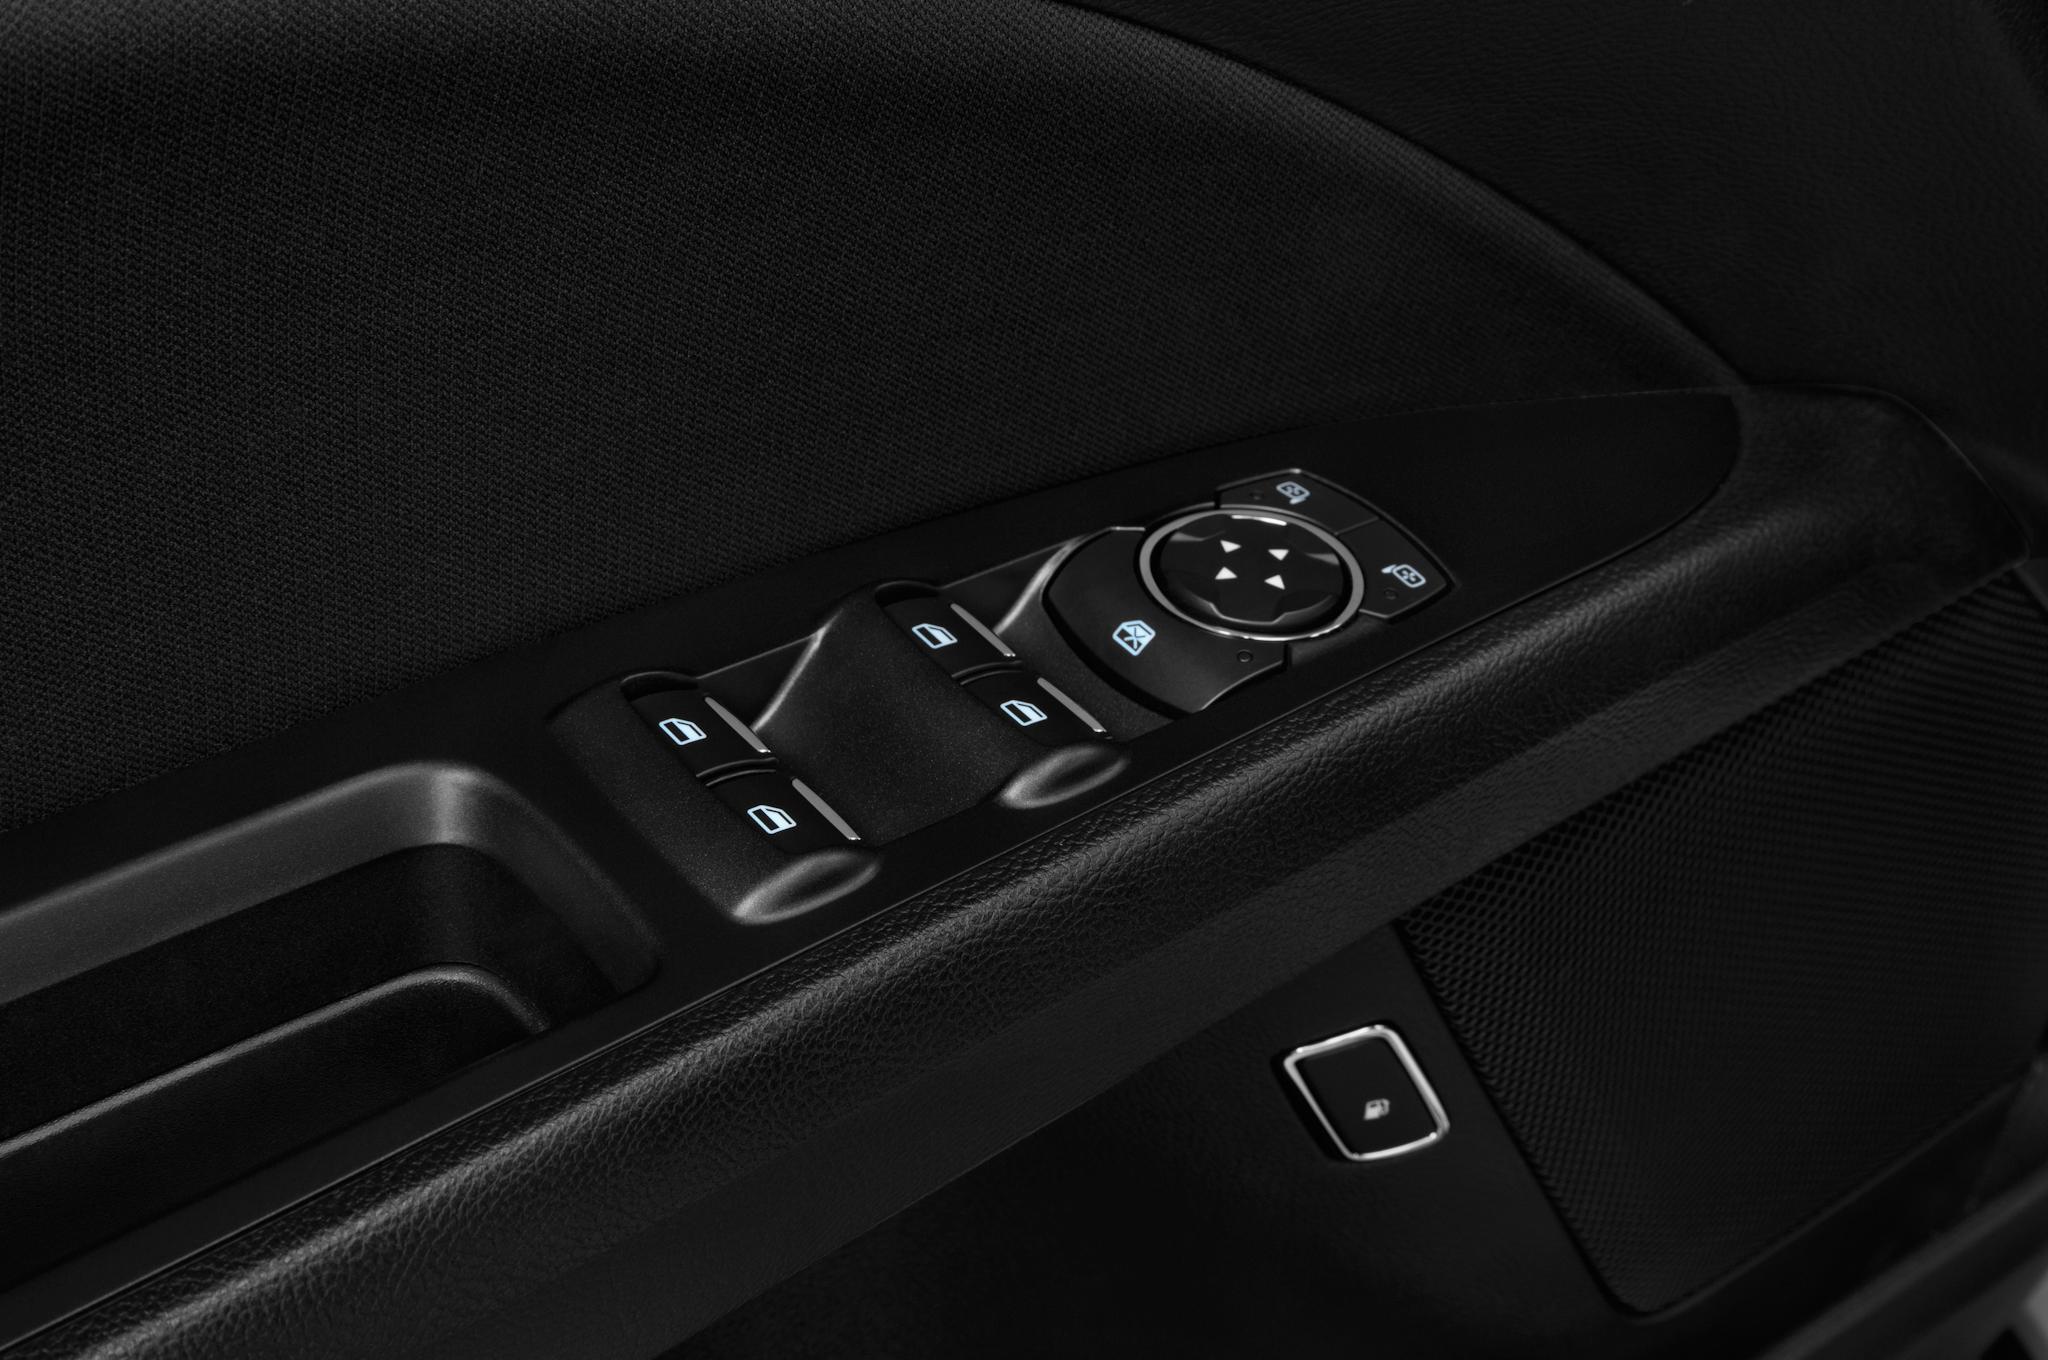 Updated Ford Fusion Hybrid Autonomous Car Looks Sleek | Automobile Magazine